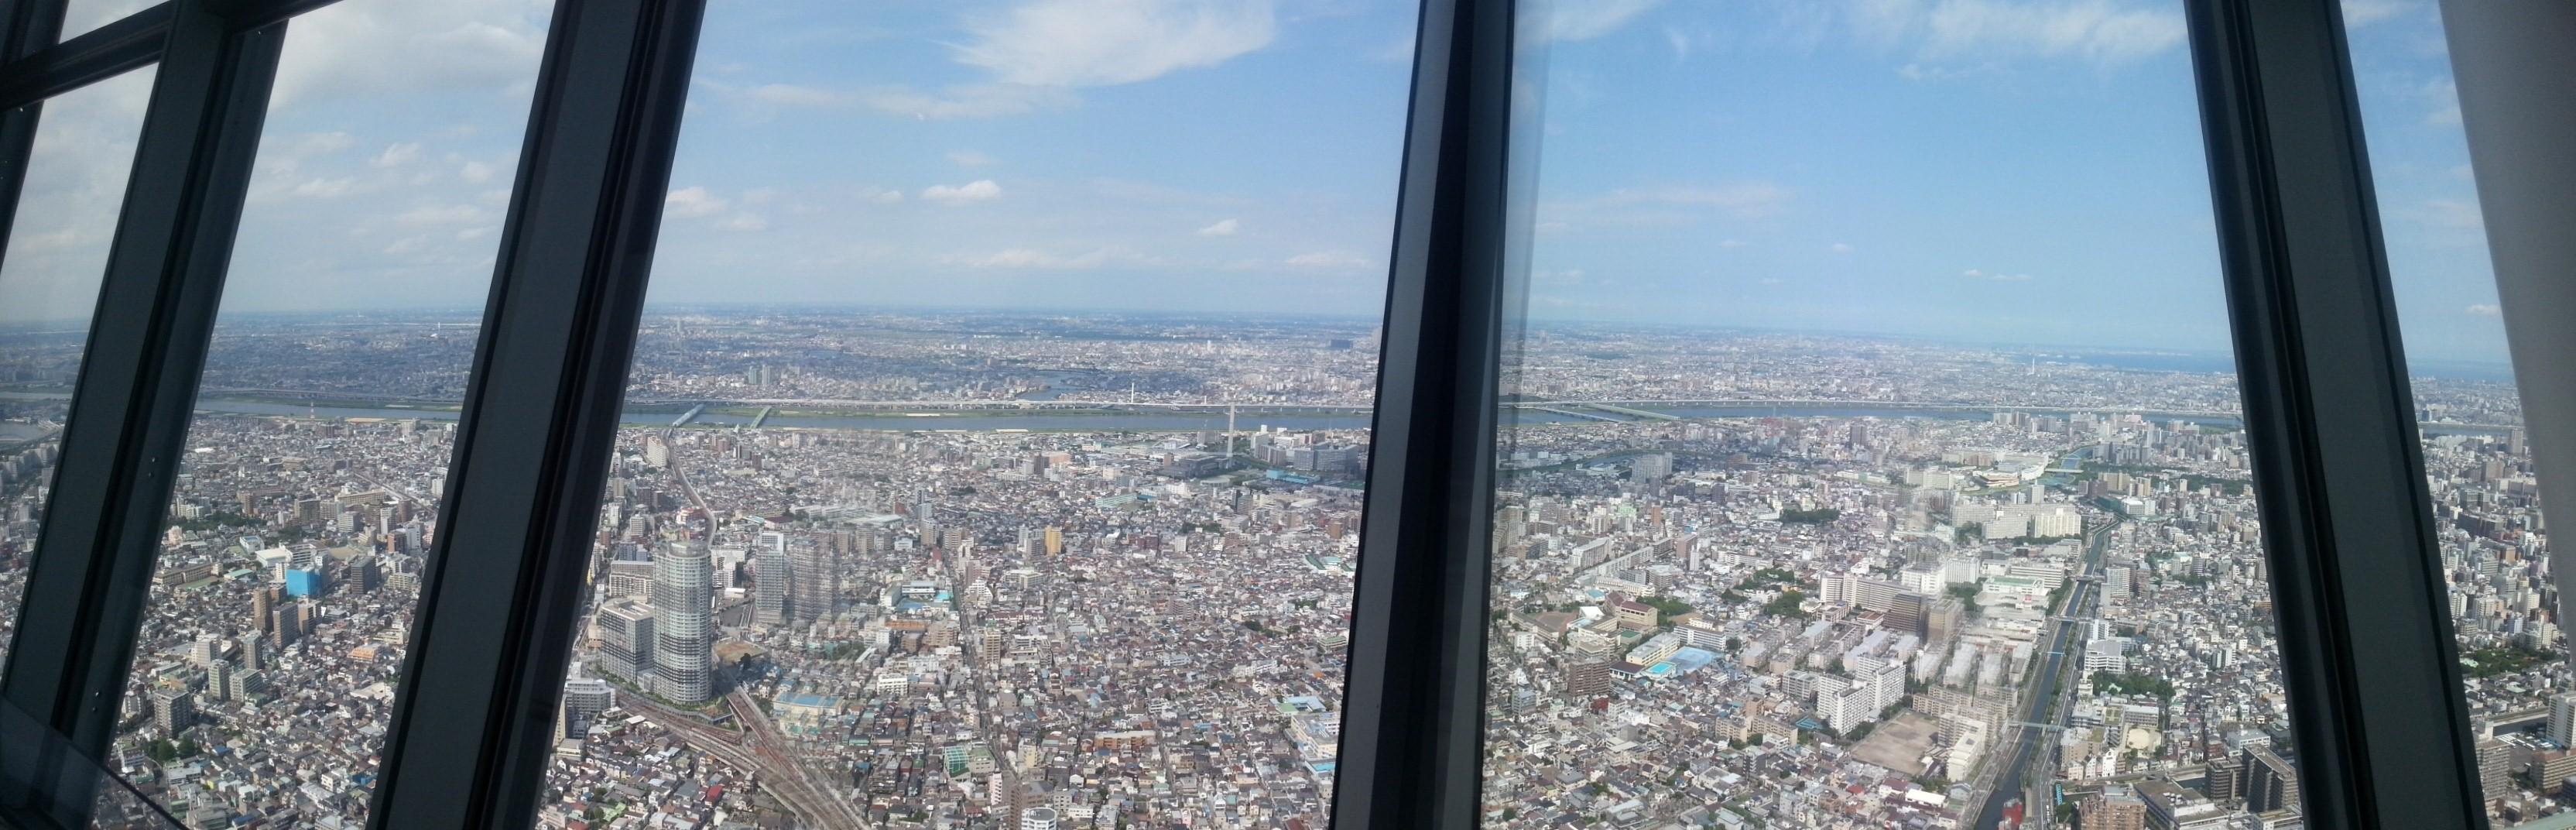 My panorama attempt at capturing the sense of a mega-city.